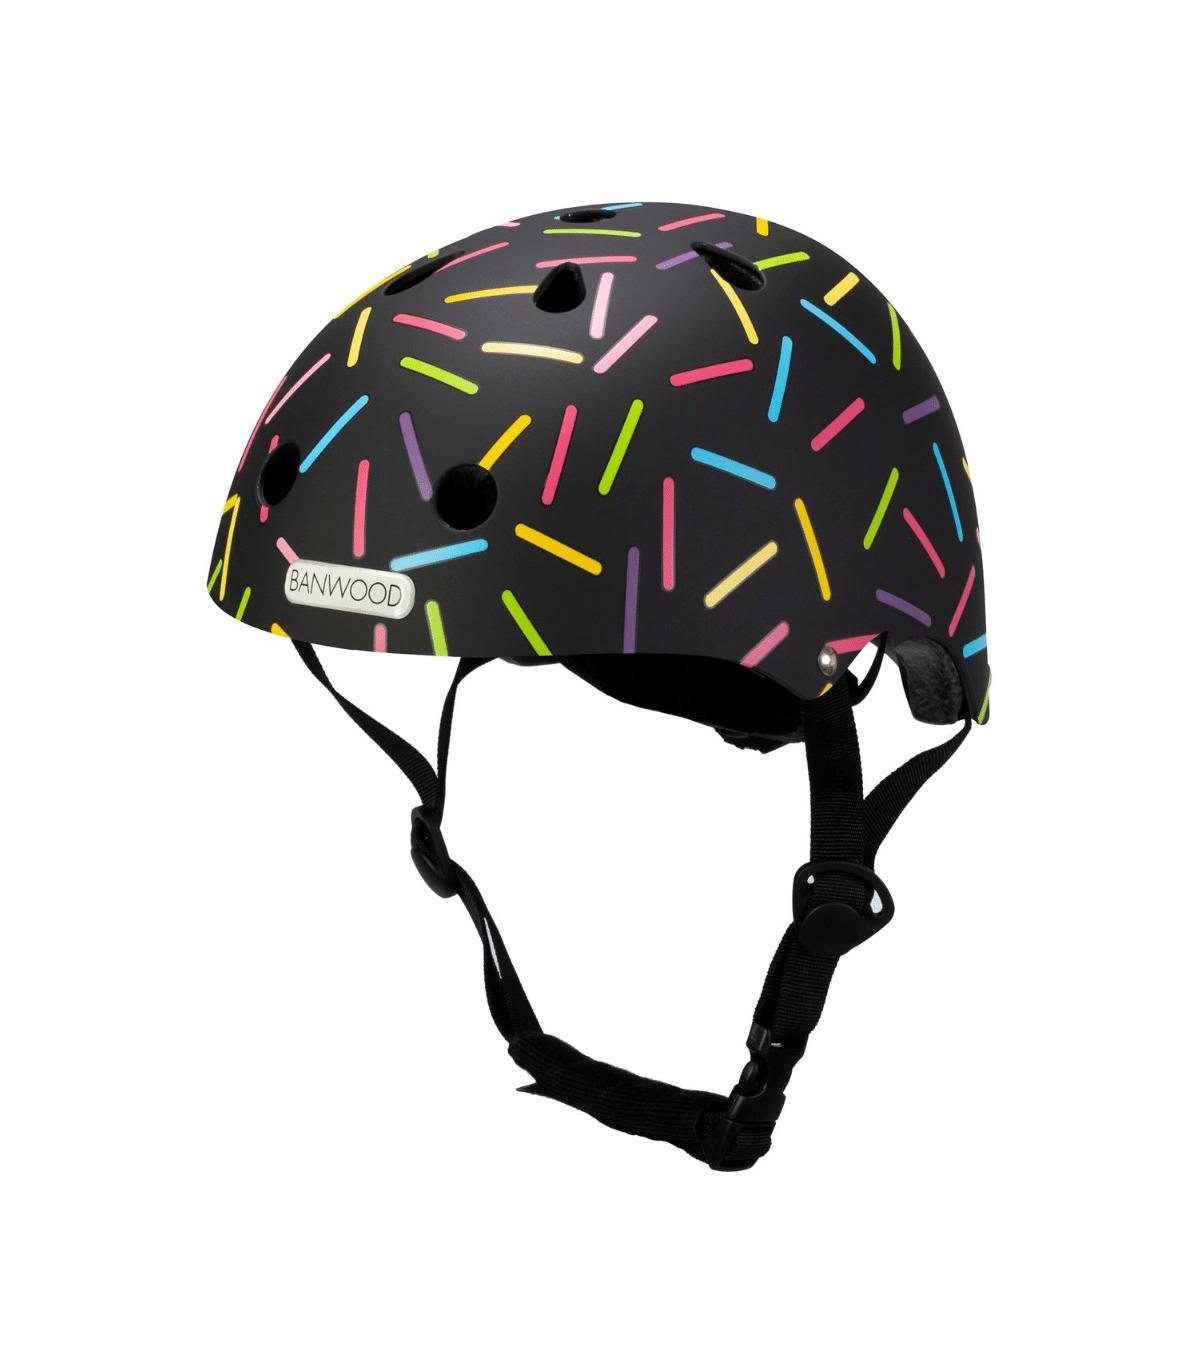 Banwood Kinder Helm Marest Allegra Schwarz